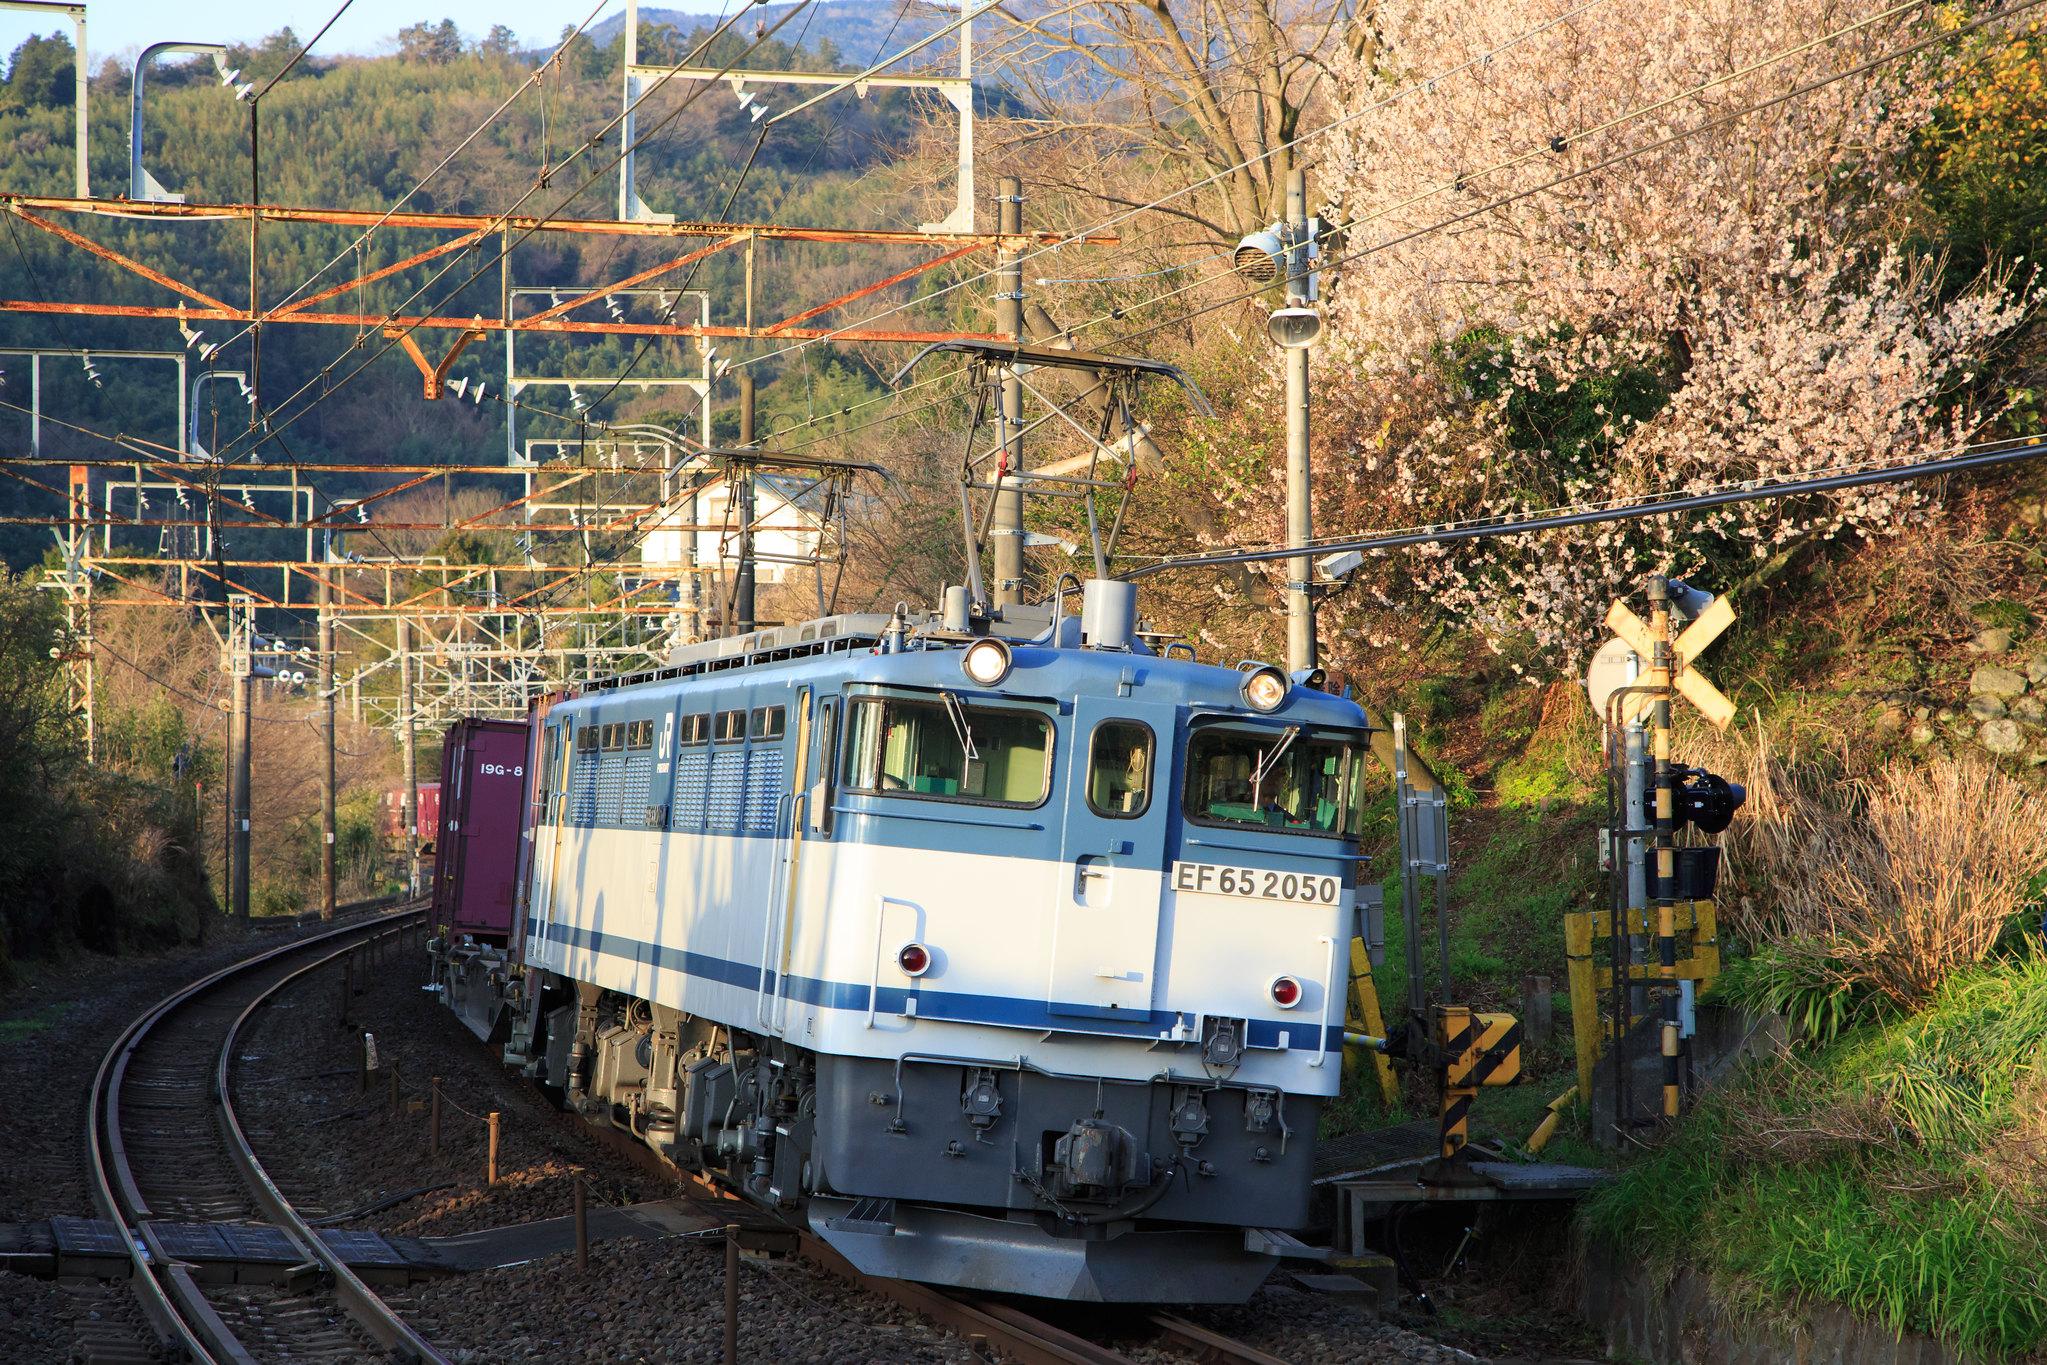 EF65 2050 / Tokaido Line